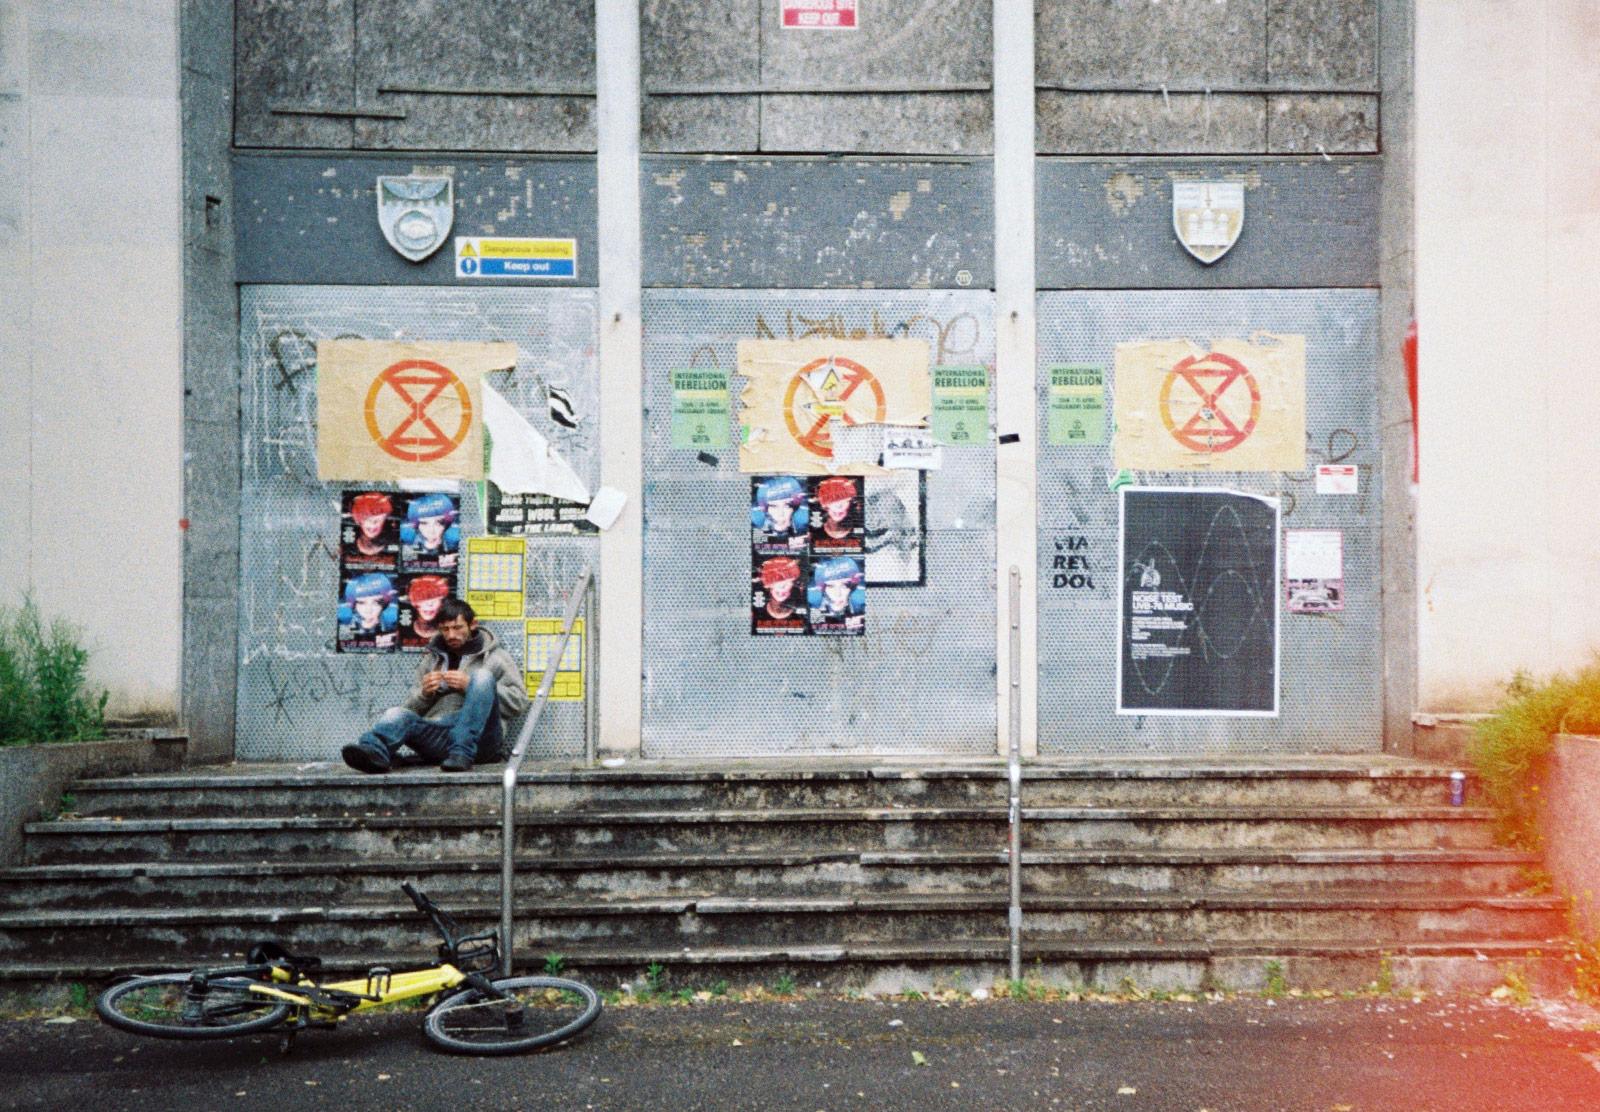 Extinction Rebellion posters